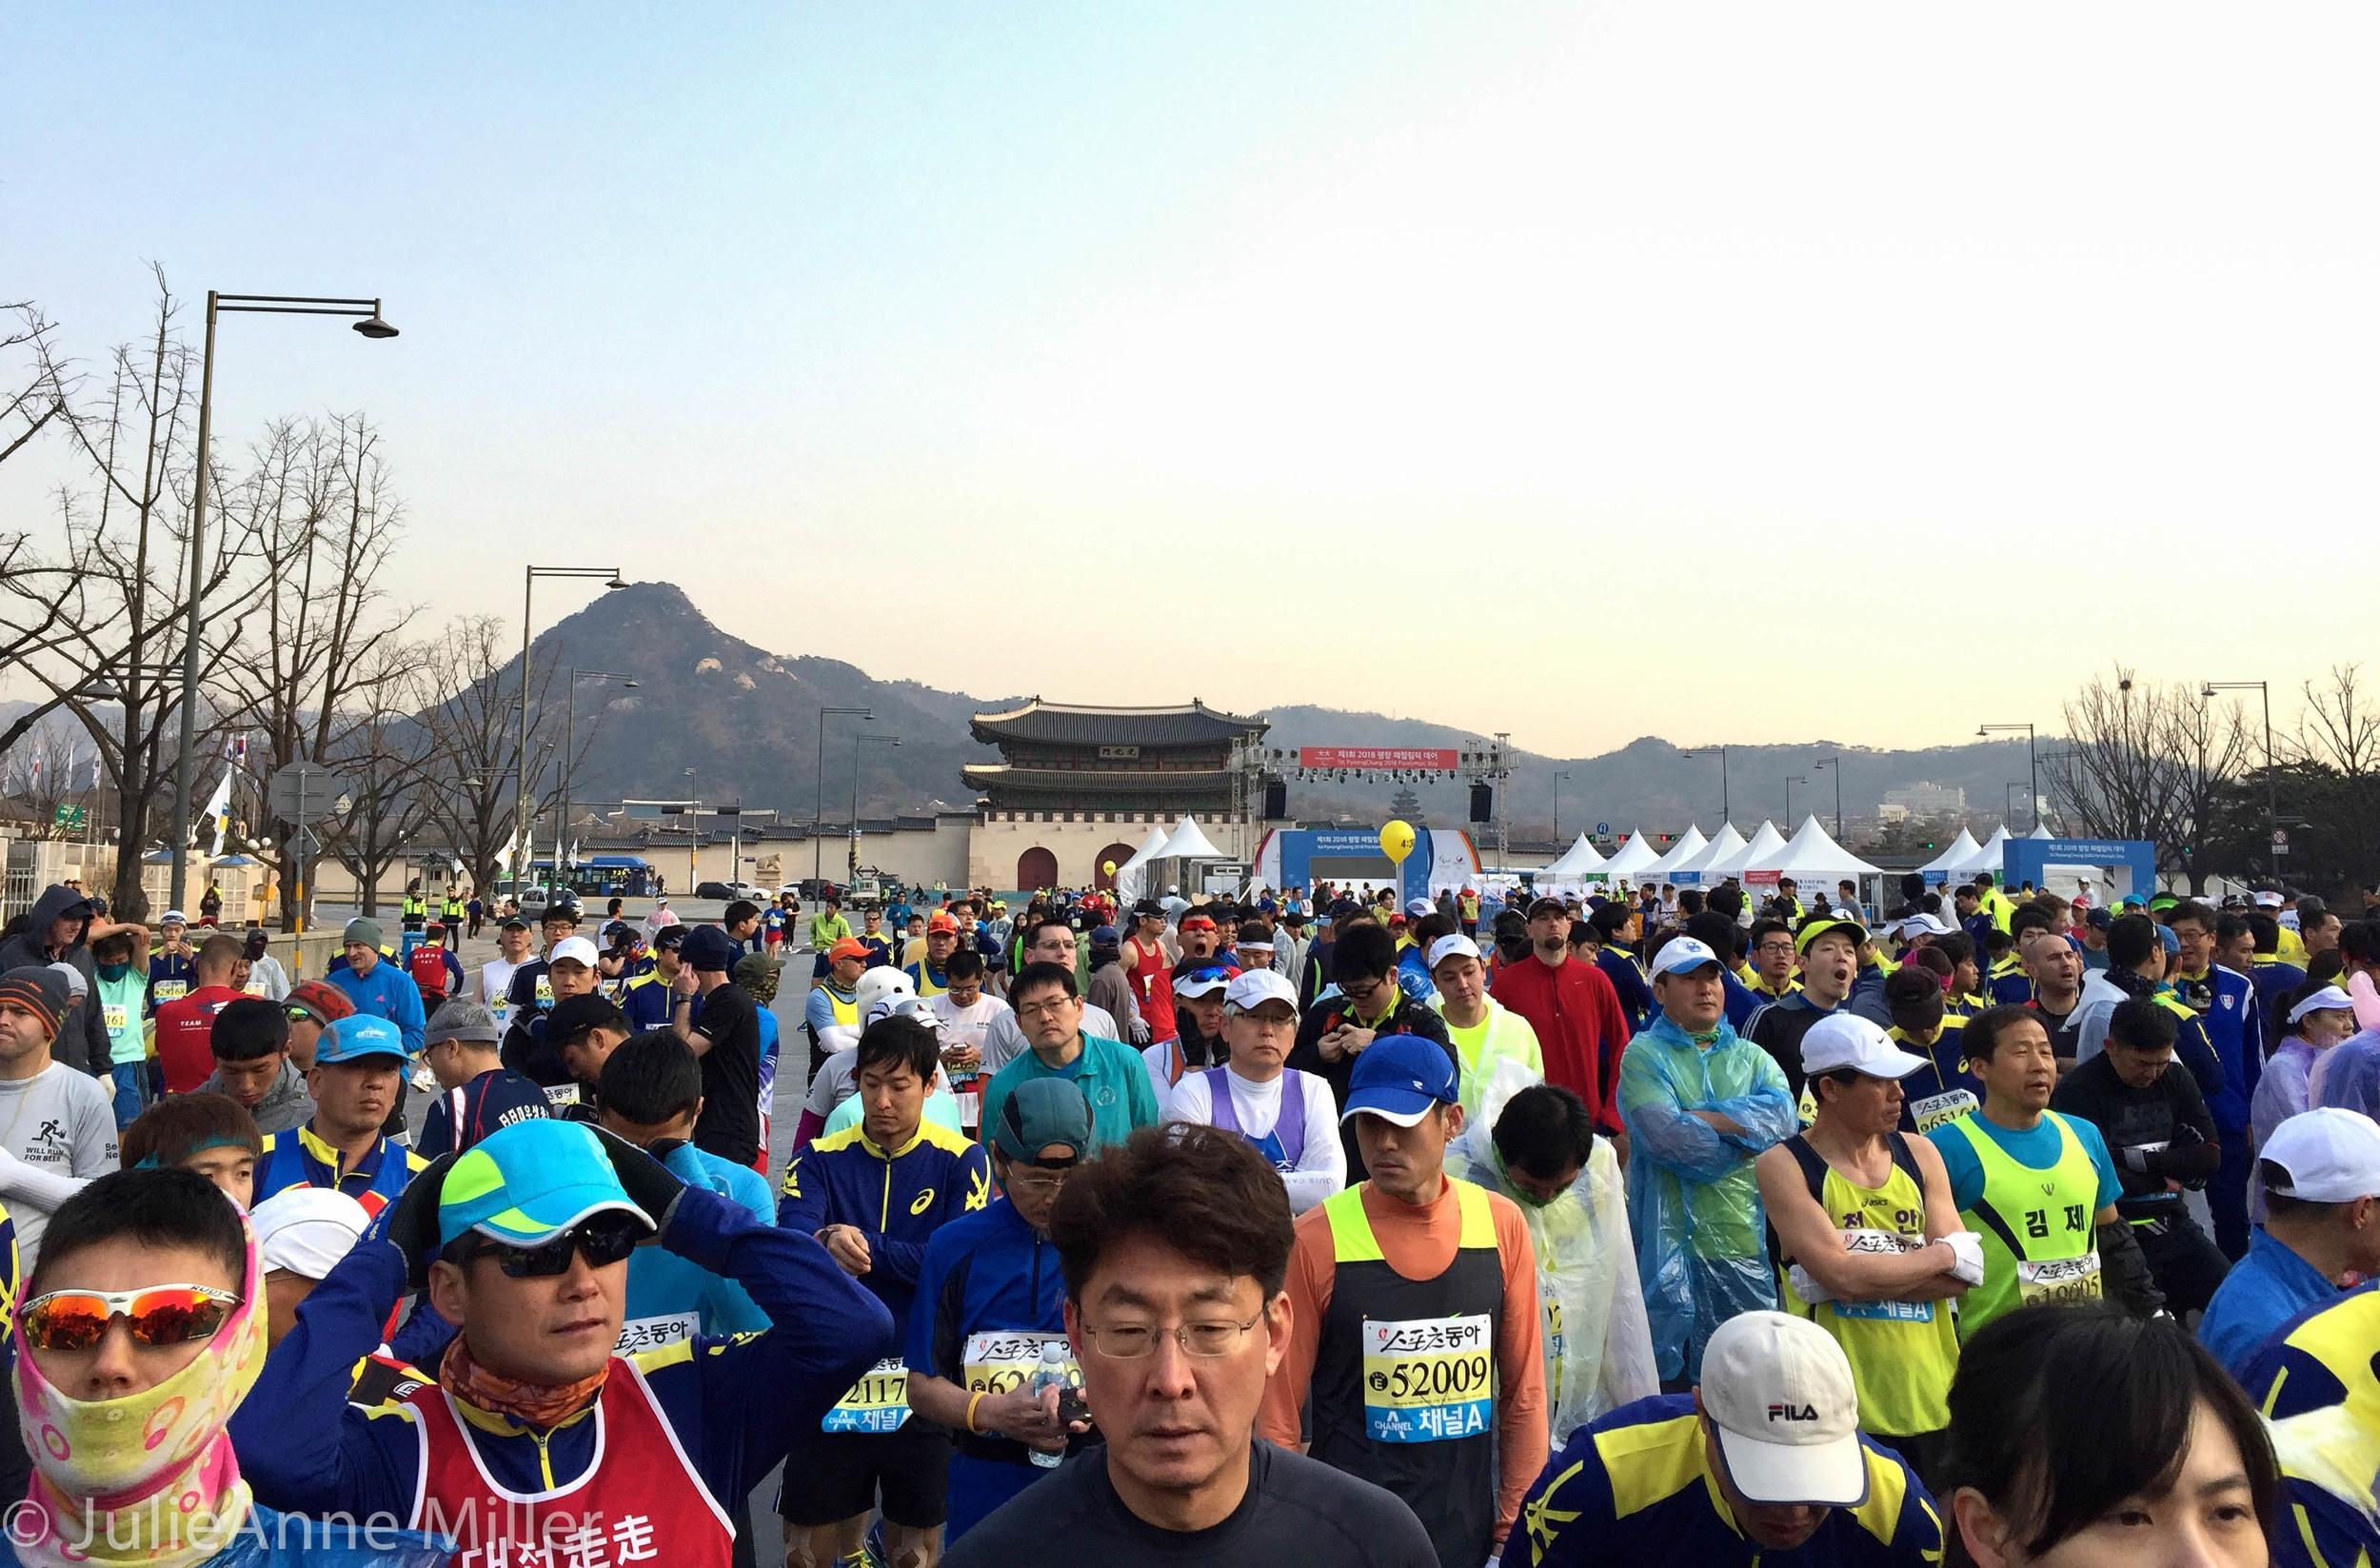 Race start at gwanghwamun square